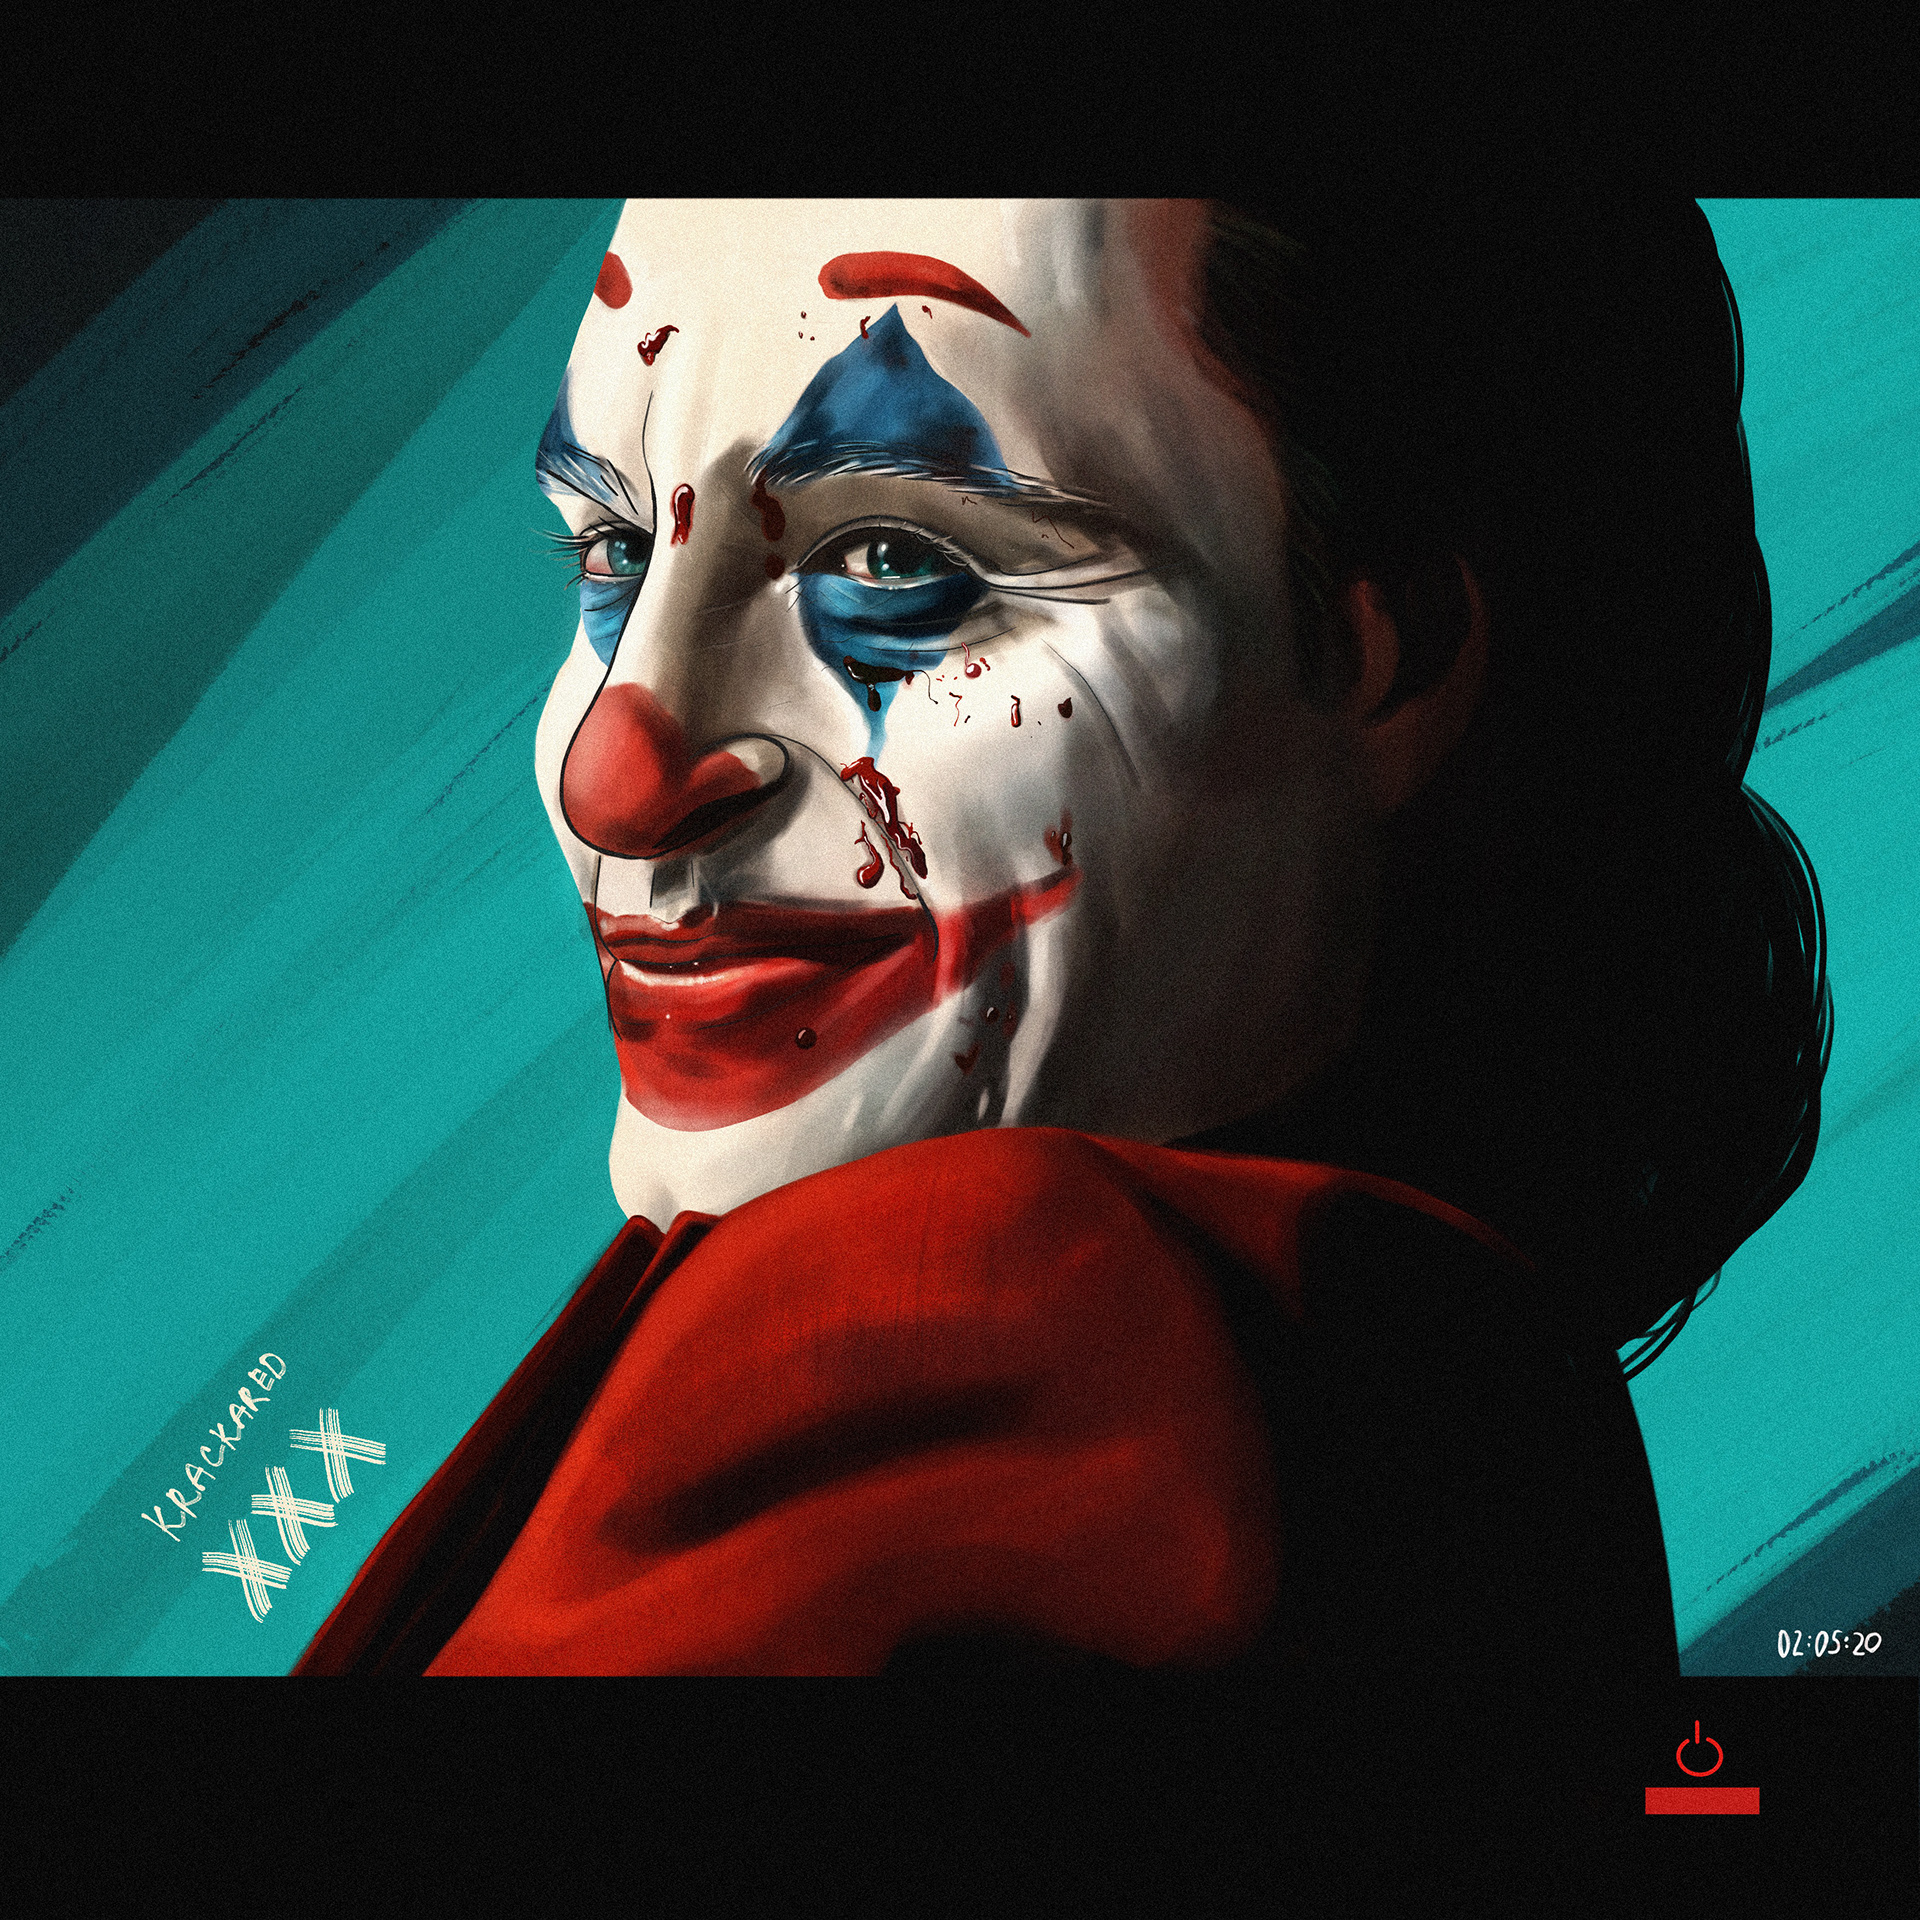 Darya Krasnova Joker Fanart